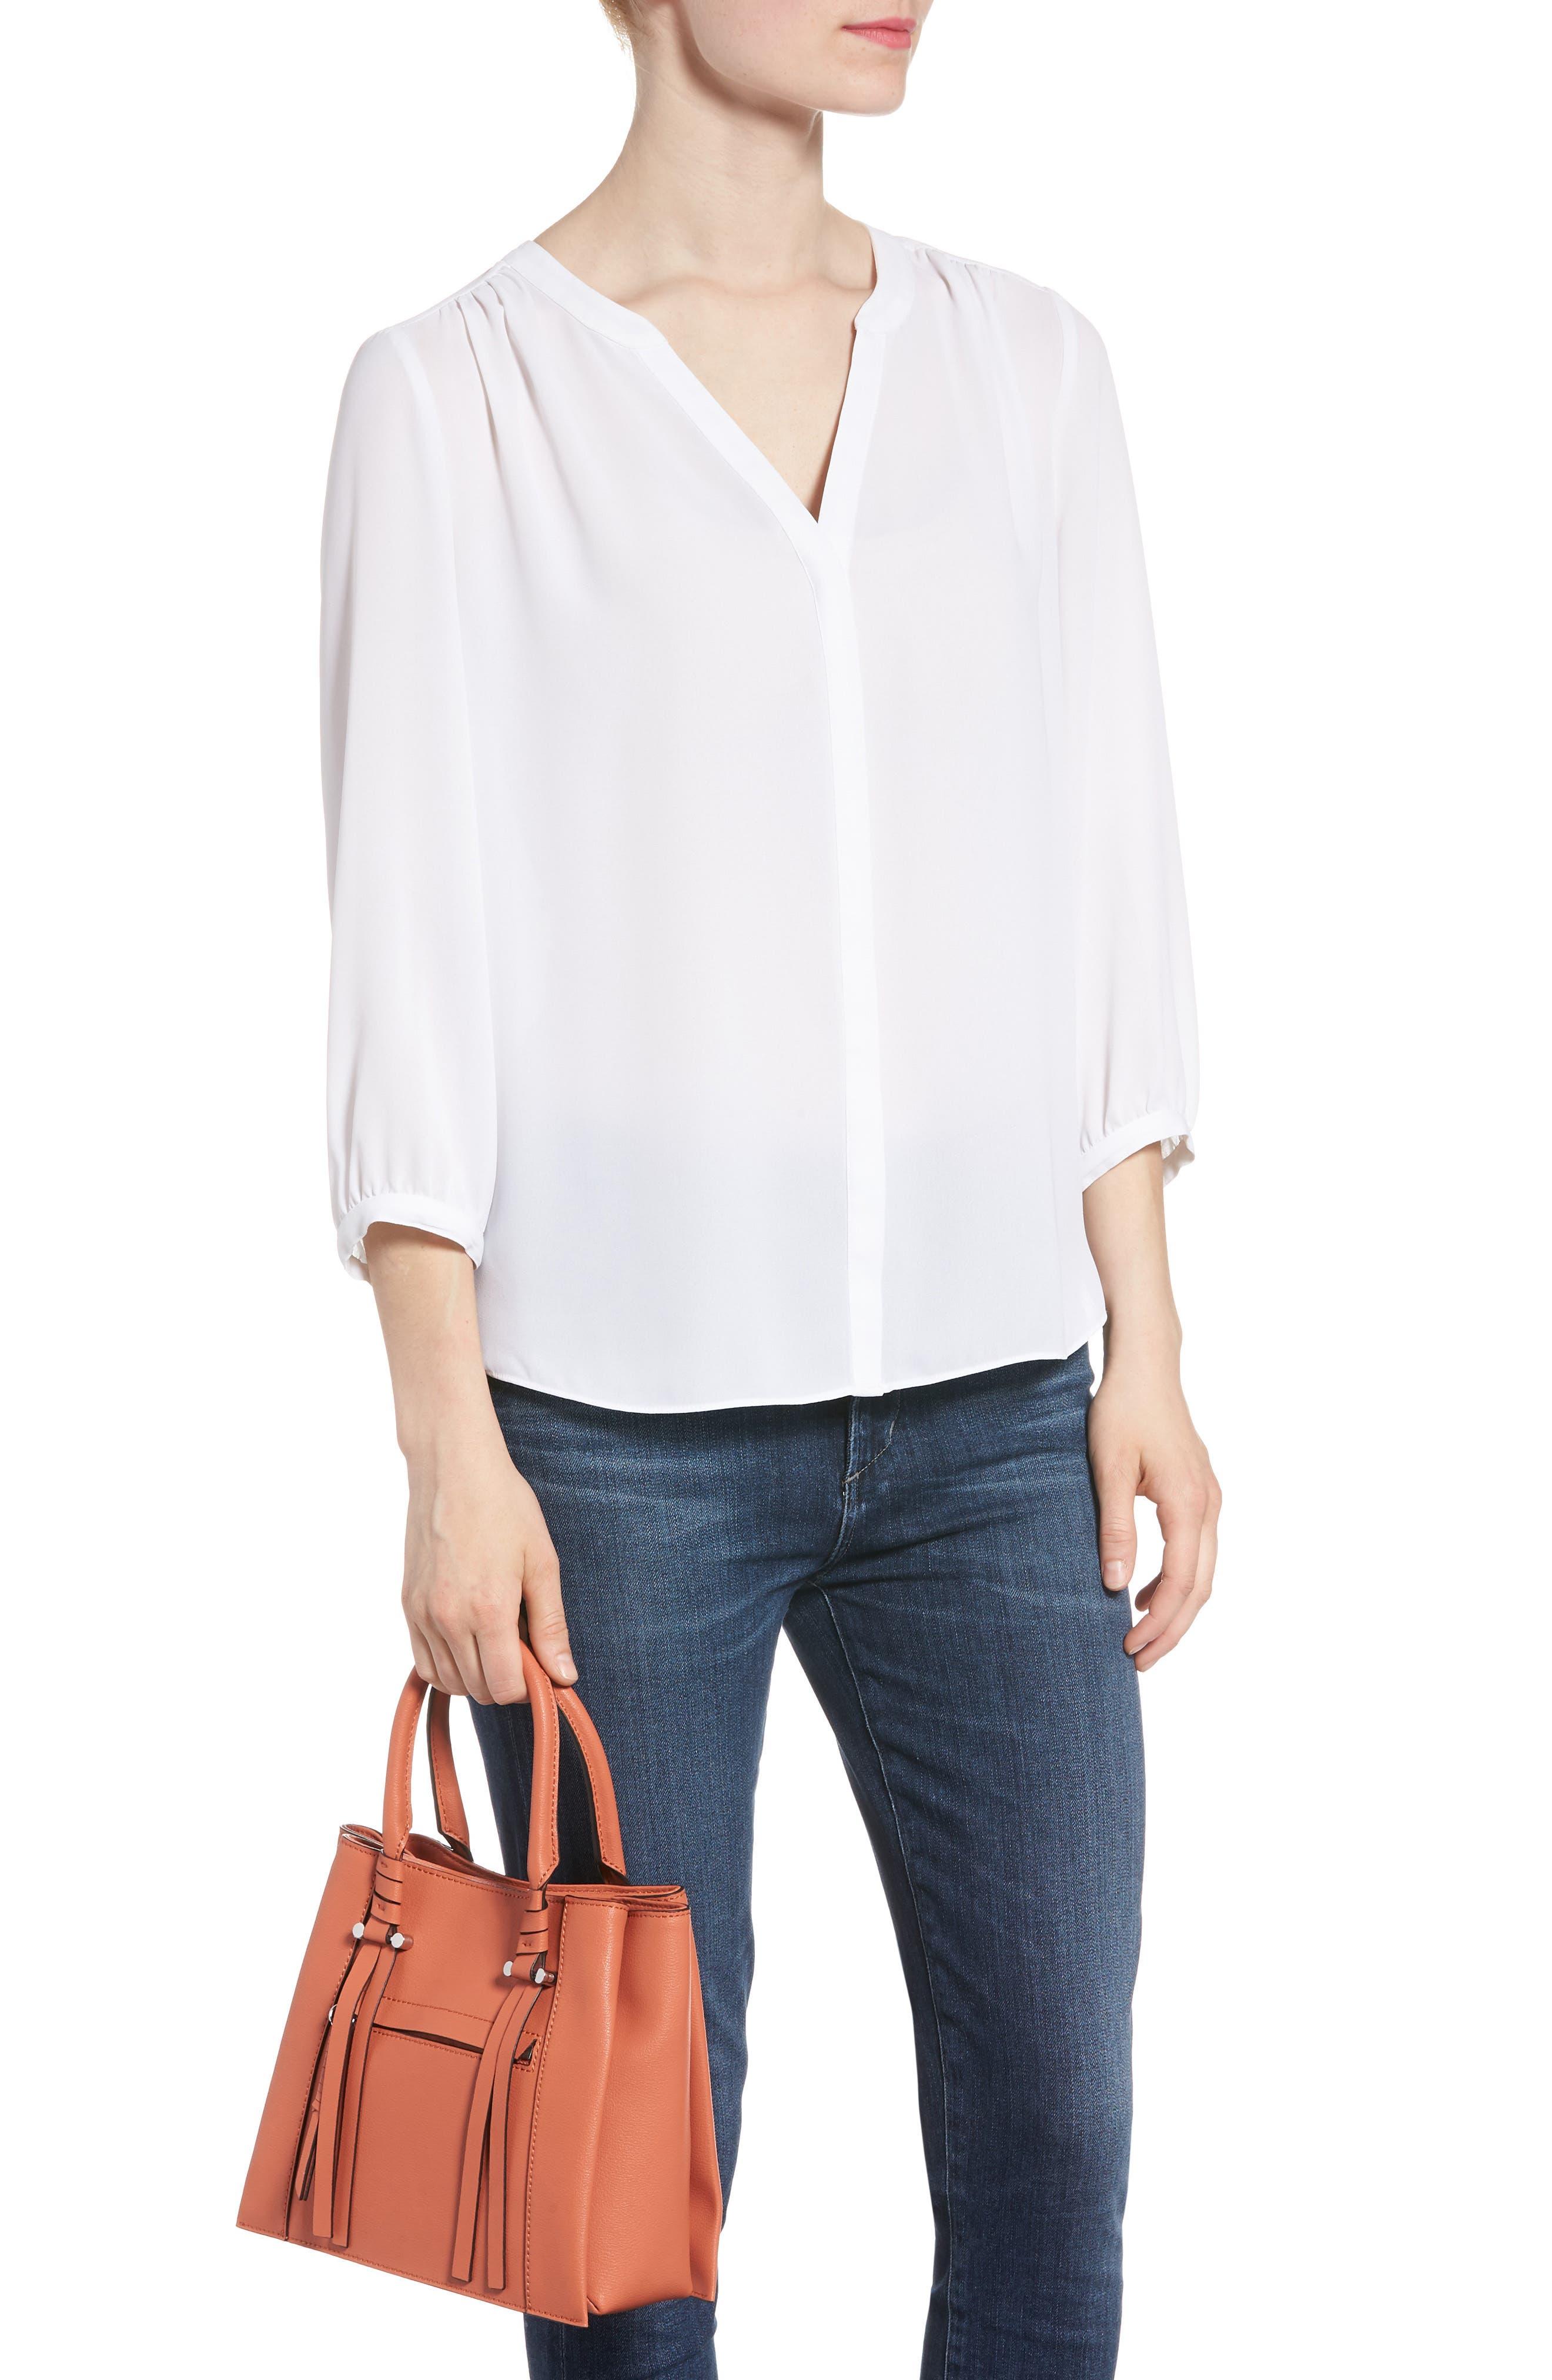 Everly Mini Shoulder Bag,                             Alternate thumbnail 2, color,